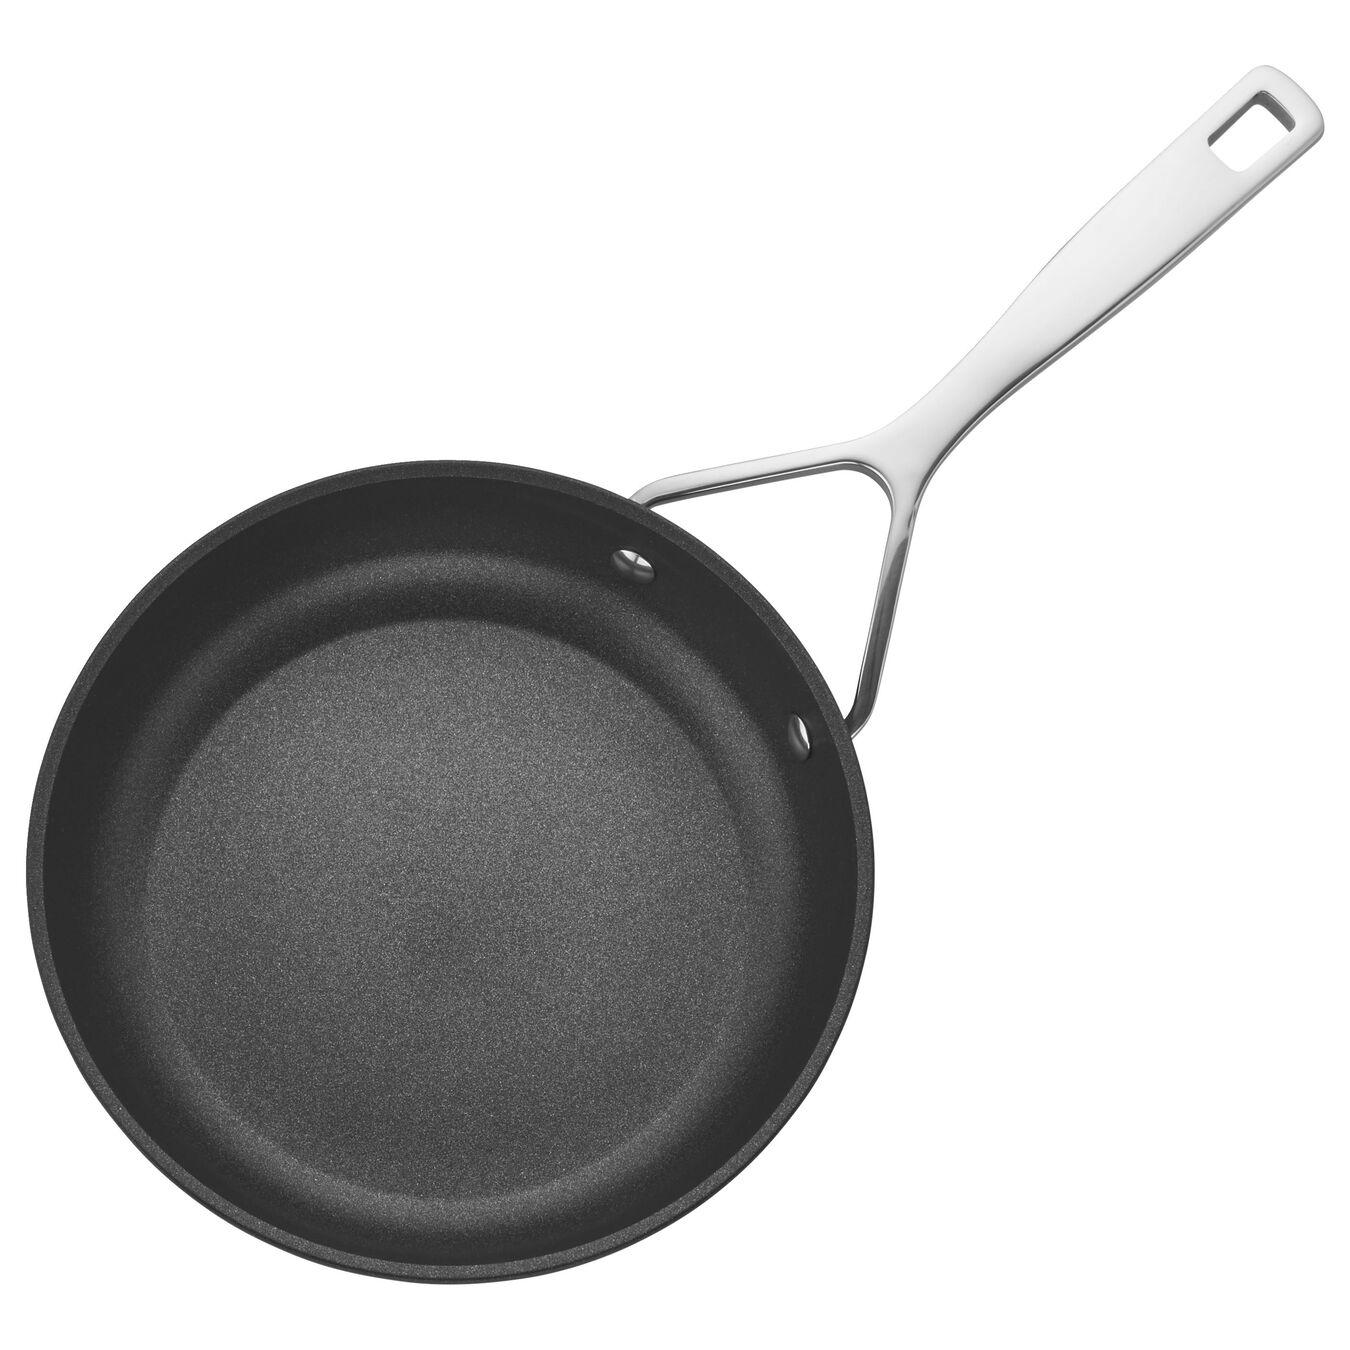 8-inch Aluminum Nonstick Fry Pan,,large 4